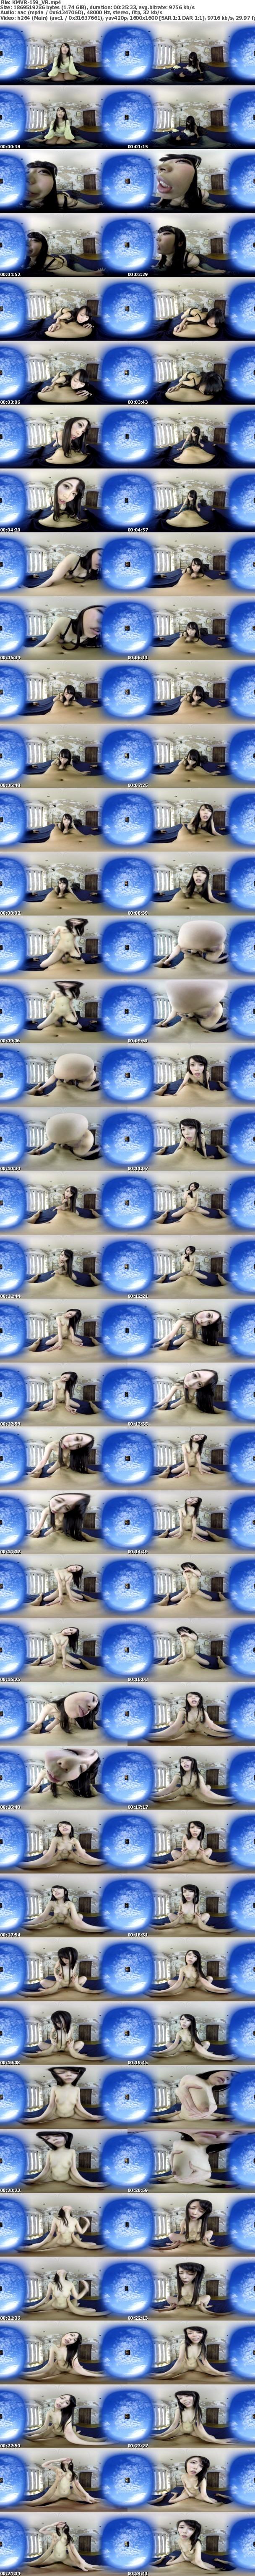 VR/3D KMVR-159 【VR】「ねえ、入れてもイイ 内緒にするから」素股で我慢出来なくなった美人デリヘル嬢と秘密のVRセックス 川菜美鈴